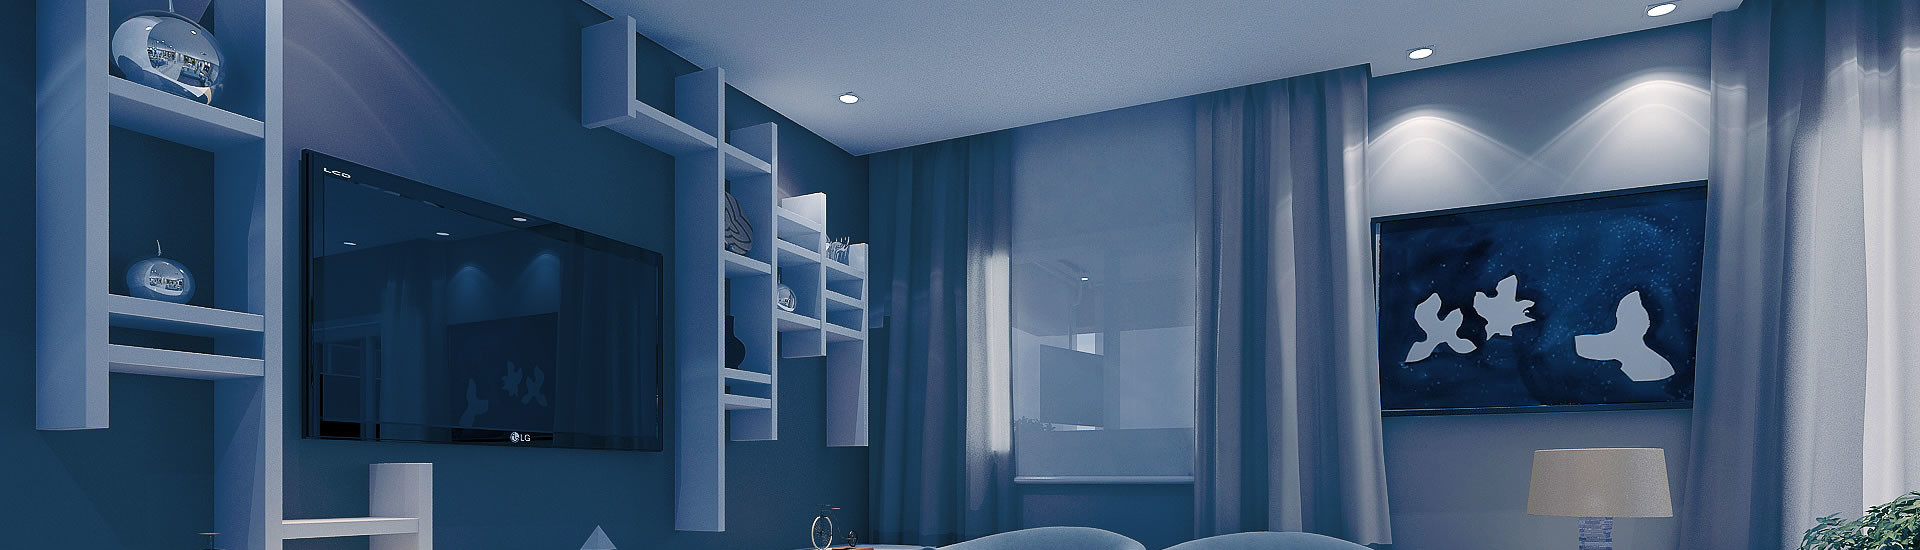 iluminacao-interior-slide02